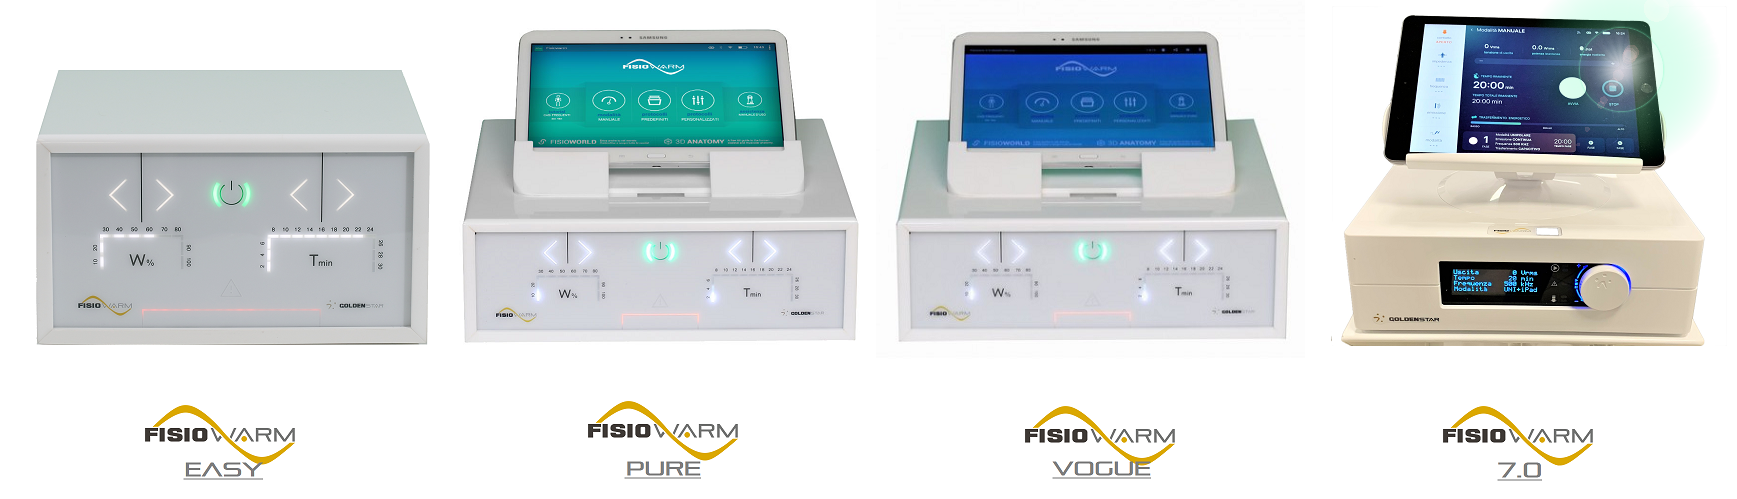 fisiowarm-easy-pure-vogue-7.0